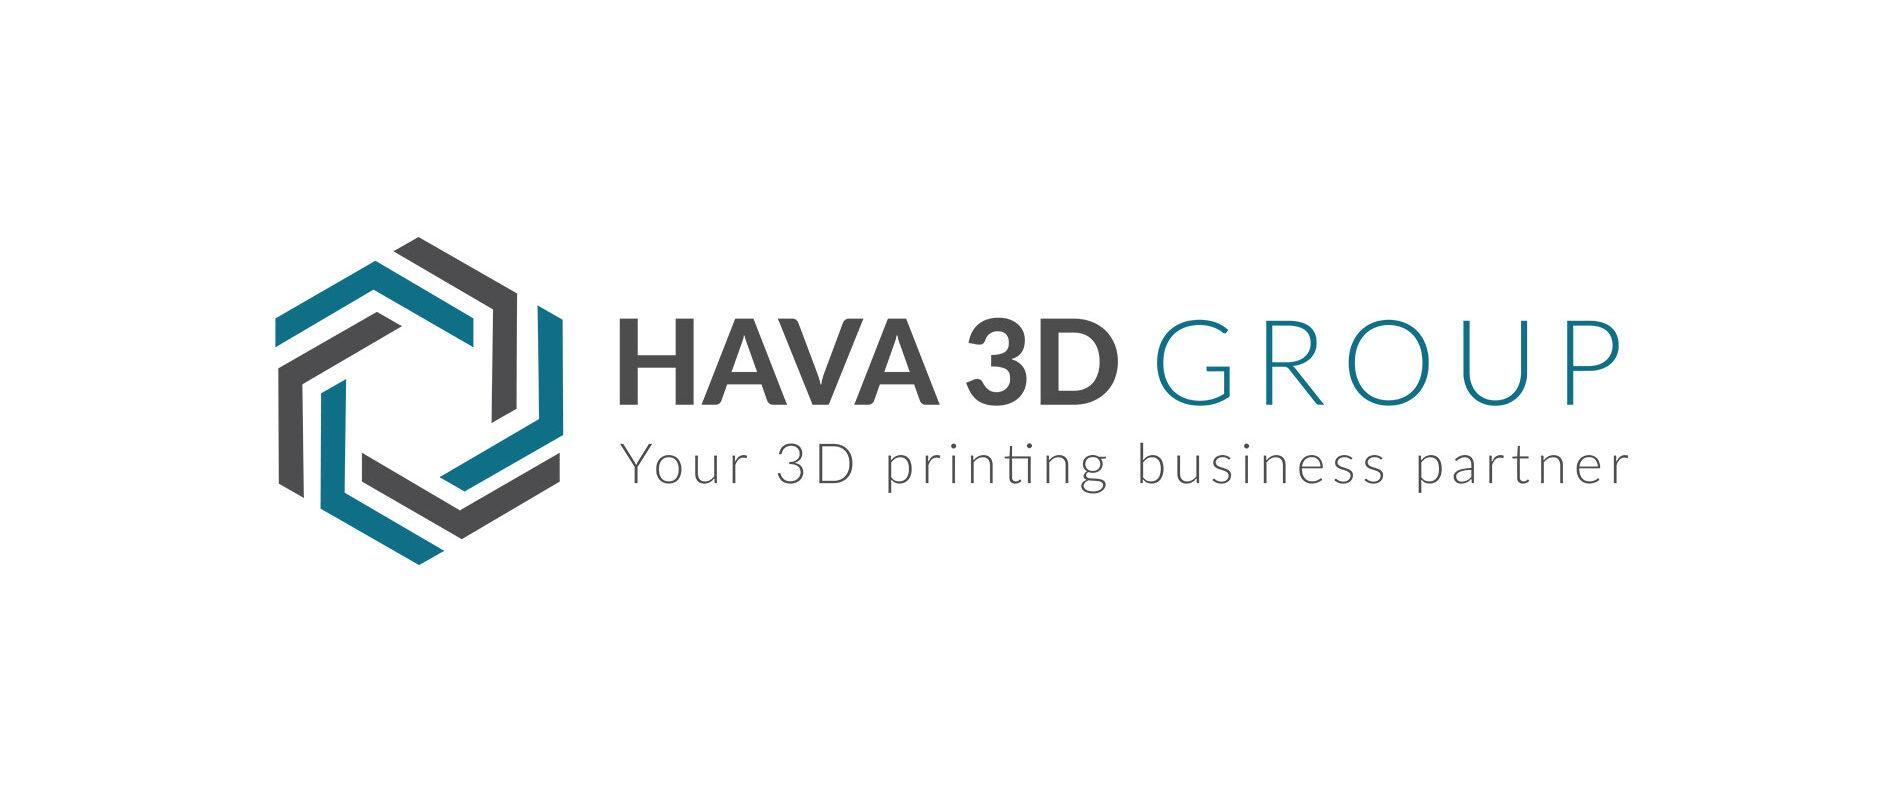 HAVA3D